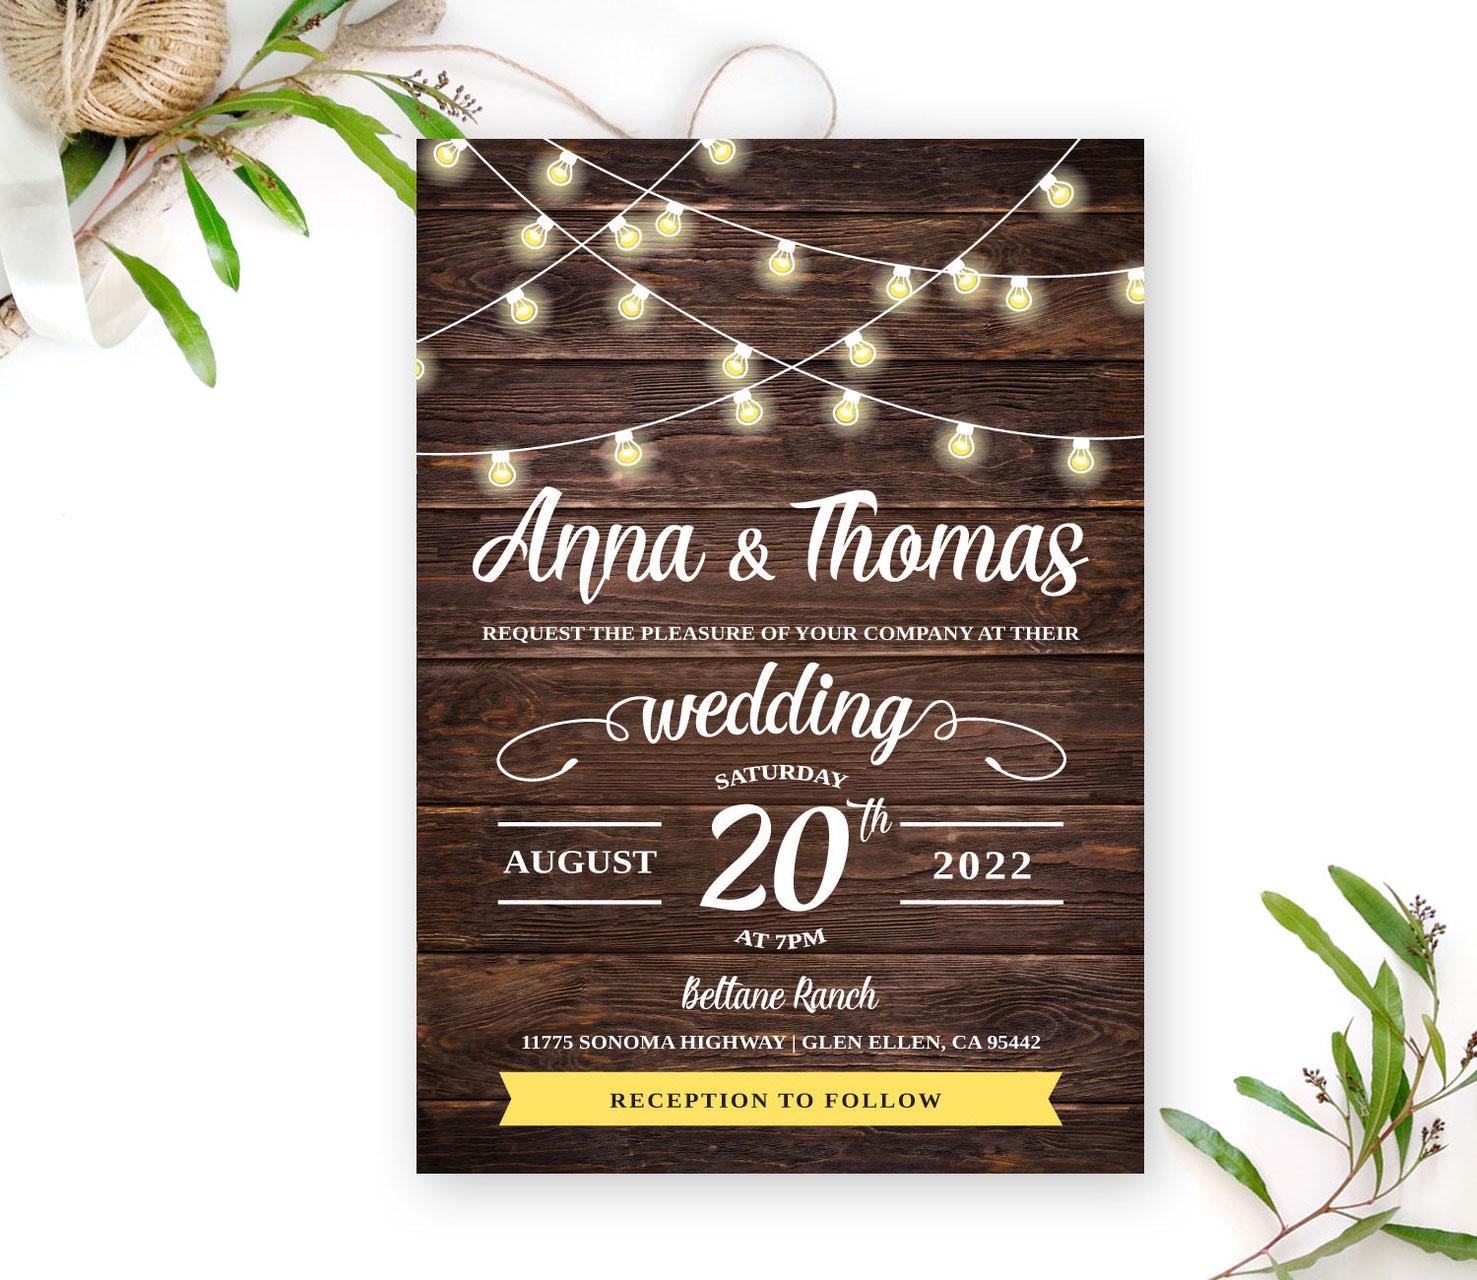 d4f214bcf1ac3 Simple Rustic Wedding Invitation